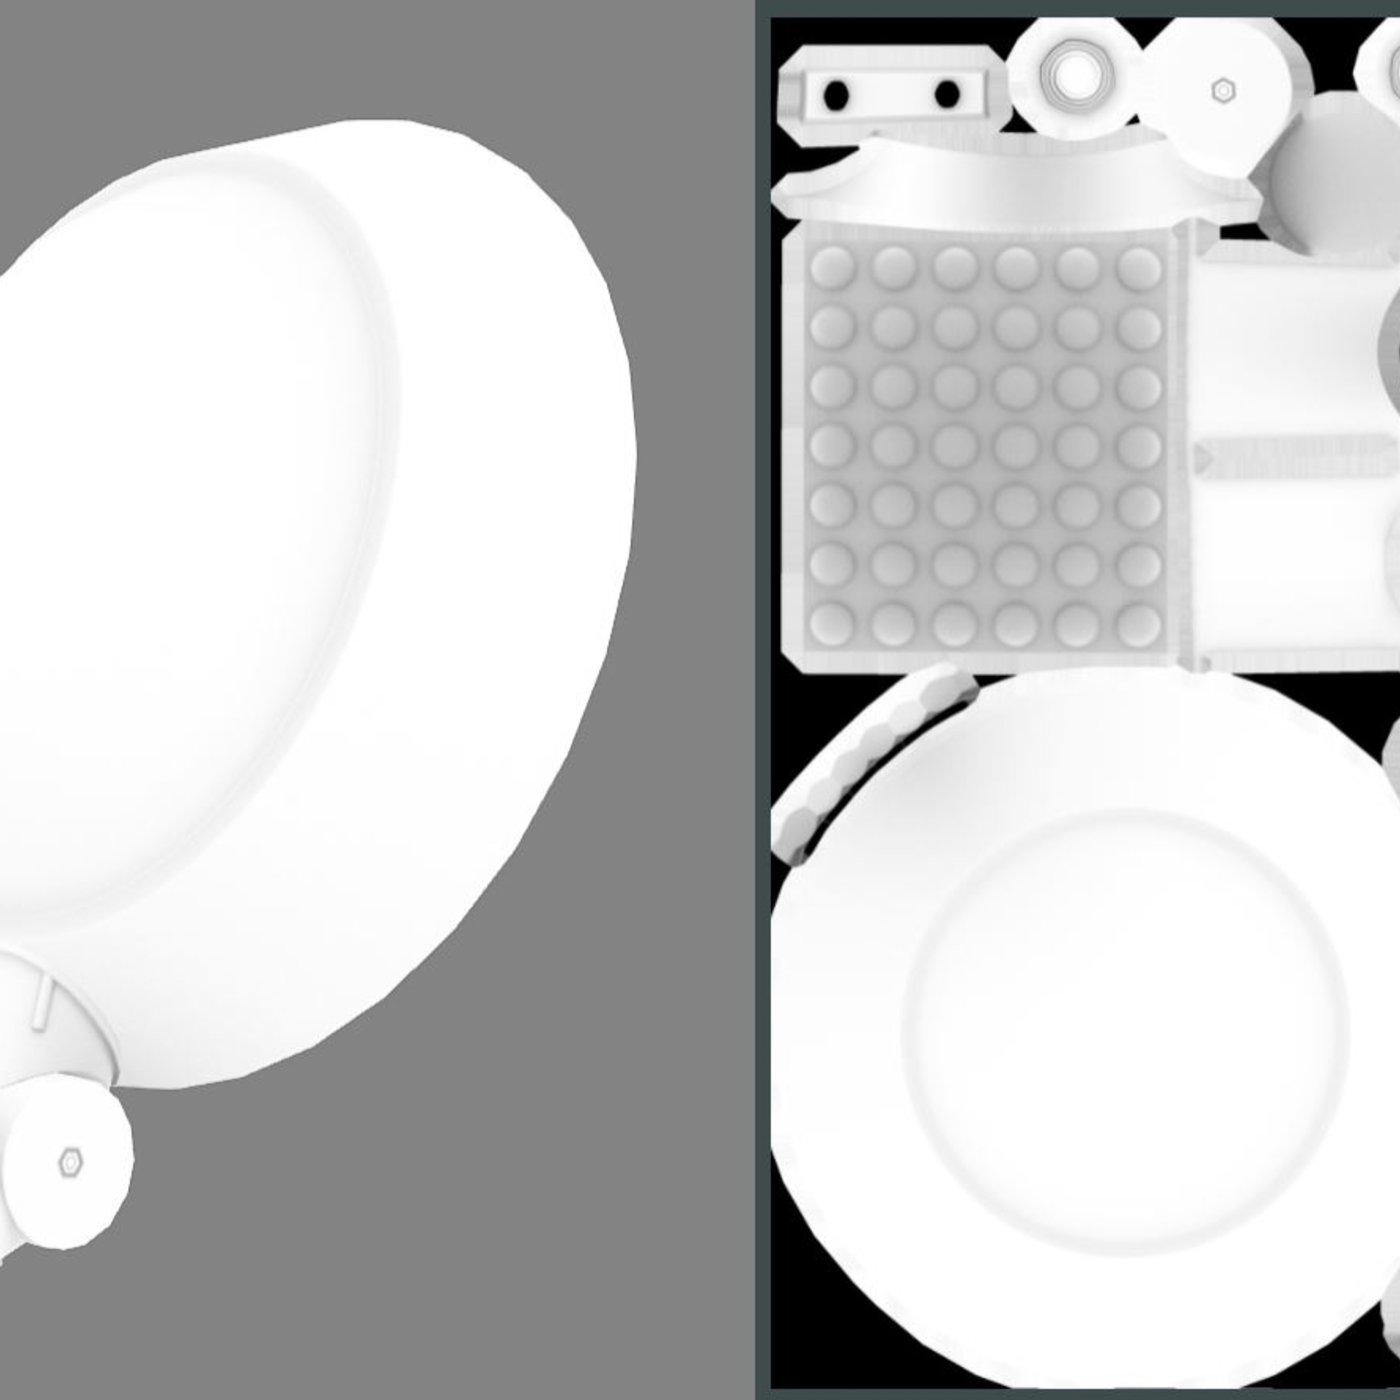 Sci-Fi City Light - Street Light 15 (Low-Poly Version) - Blender-2.80.1